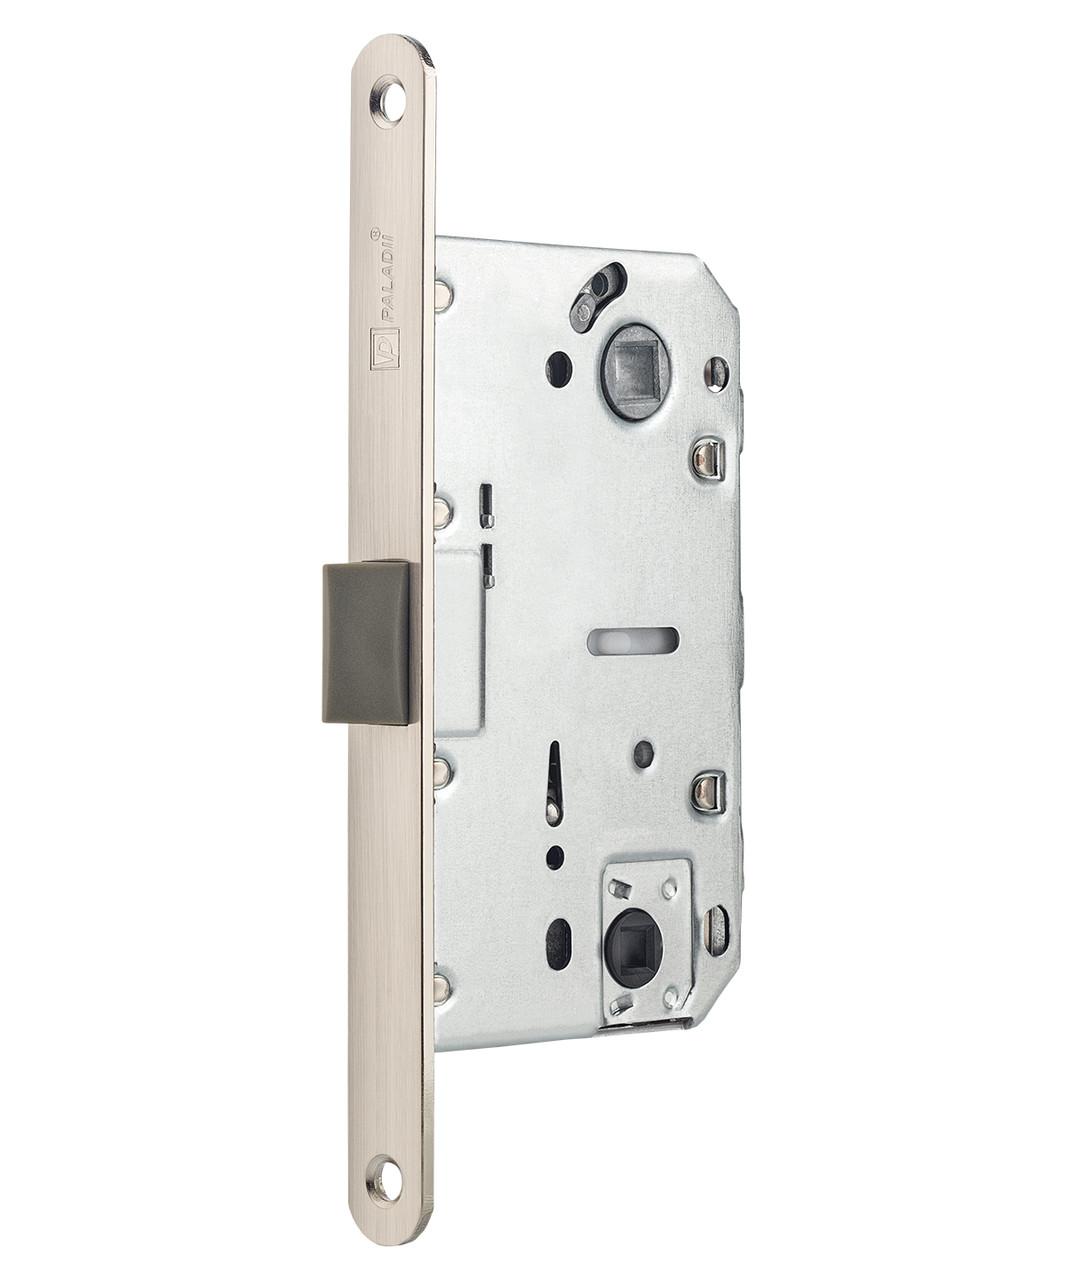 Механизм межкомнатный Paladii 96*50*18мм WC 410B PVC Kevlar SN сатен